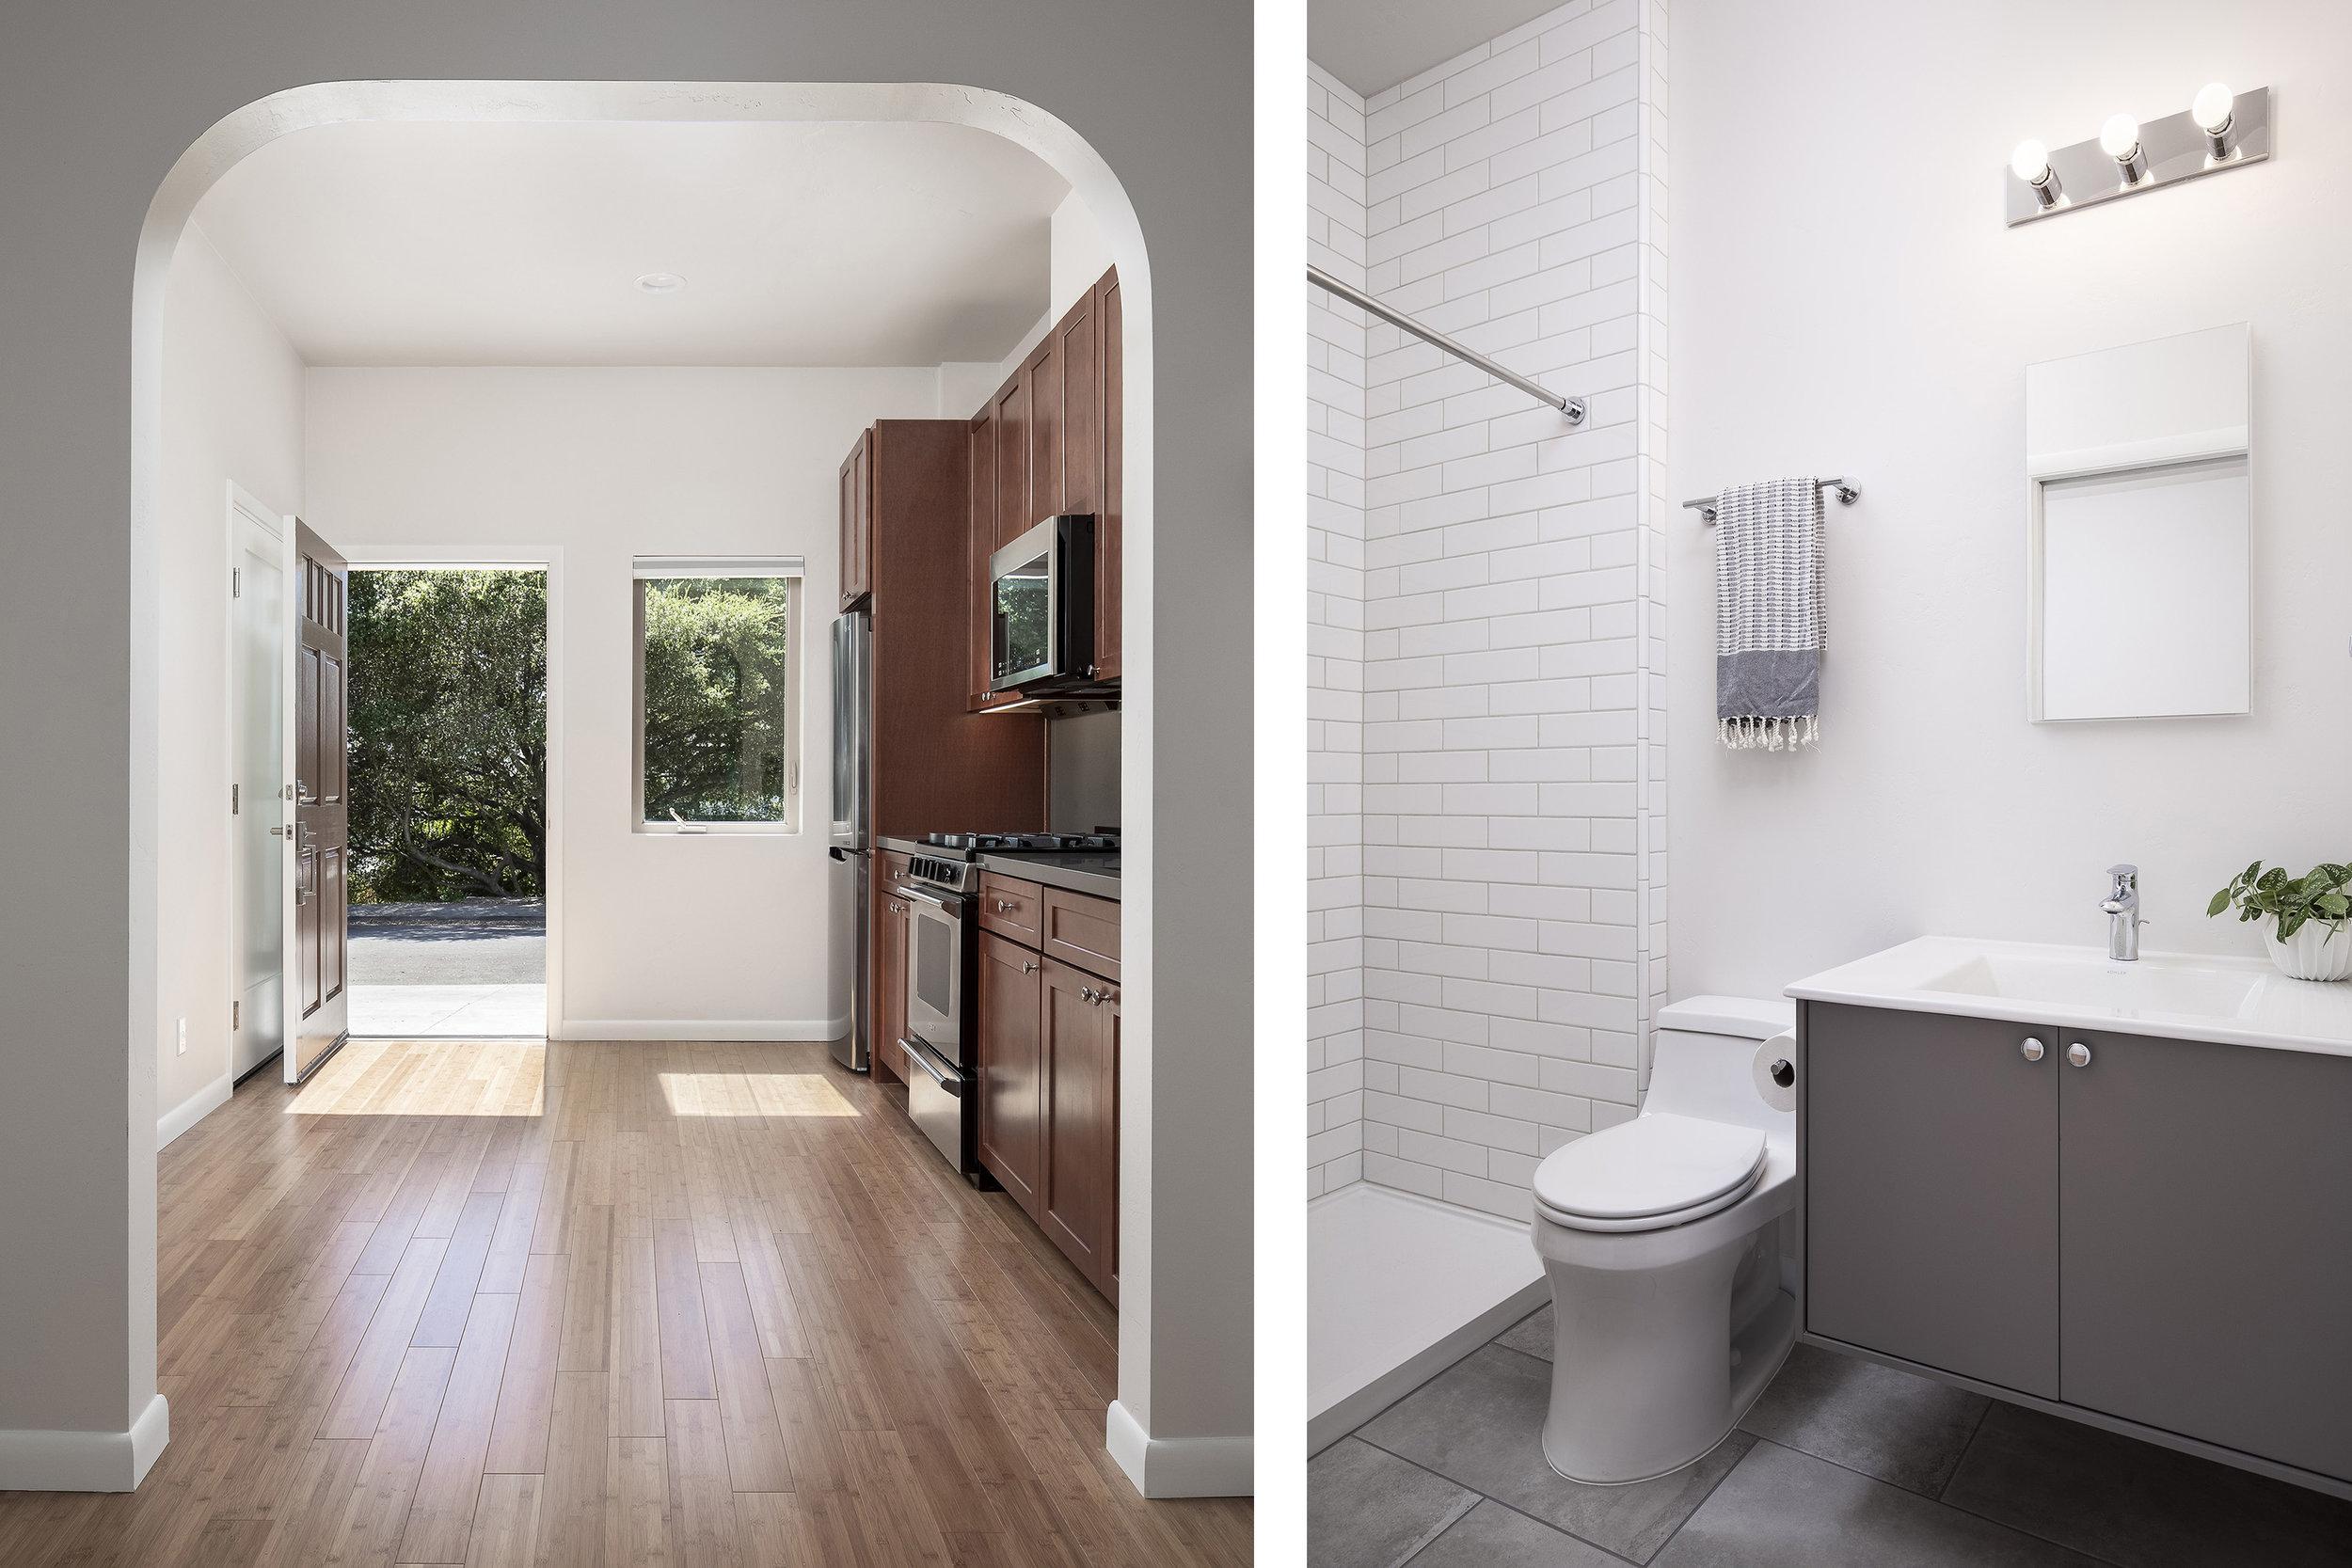 Small modern ADU interior kitchen and bathroom